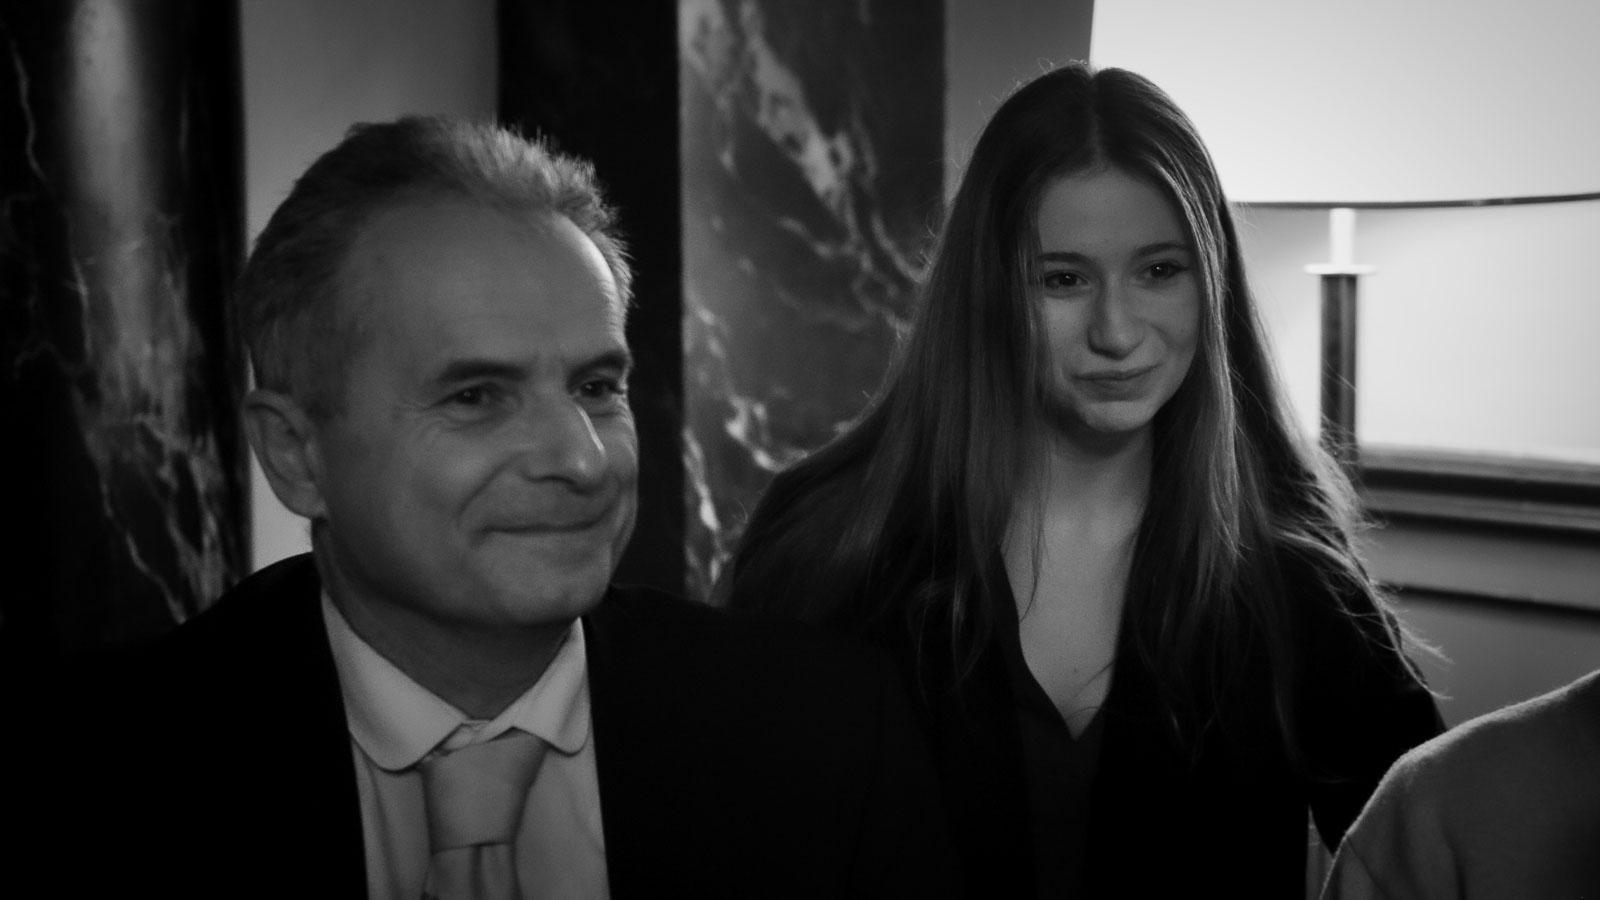 Pierre Smolik with Amina Jendly